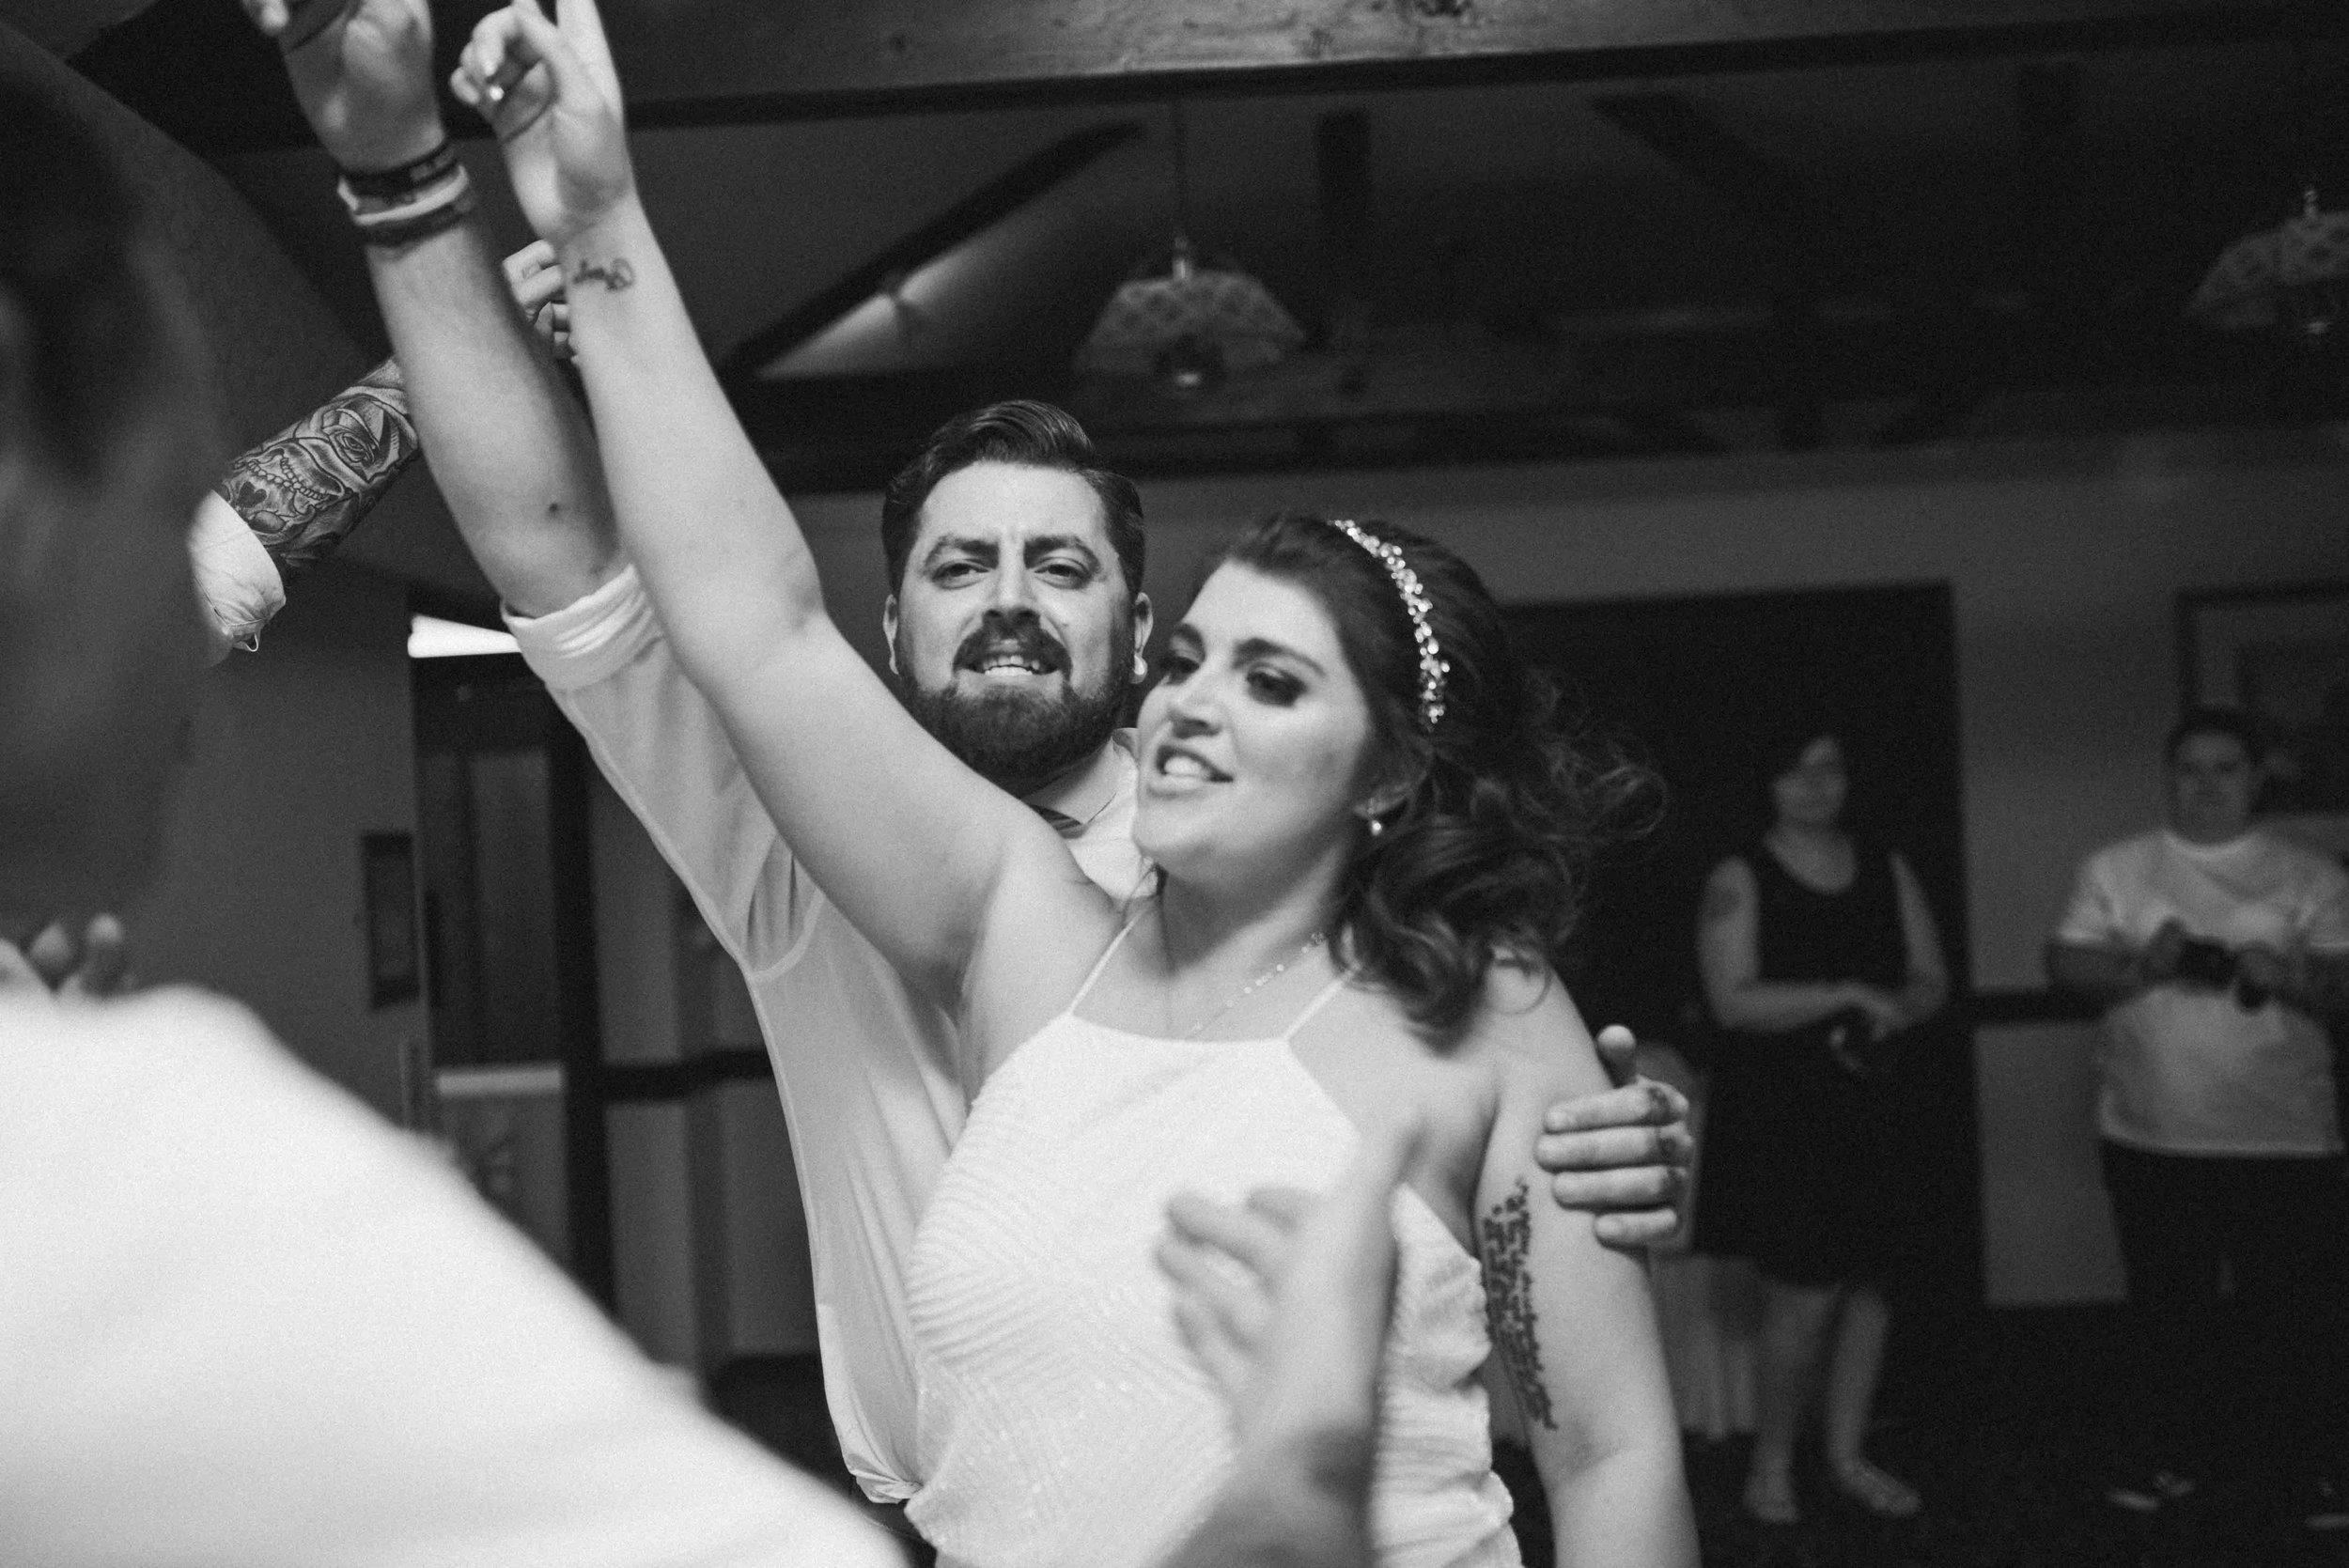 Lea-cooper-photography-wedding-photography-wolverhampton-patshull-park-hotel-wedding-pattingham-wolverhampton-west-midlands-uk-14.JPG